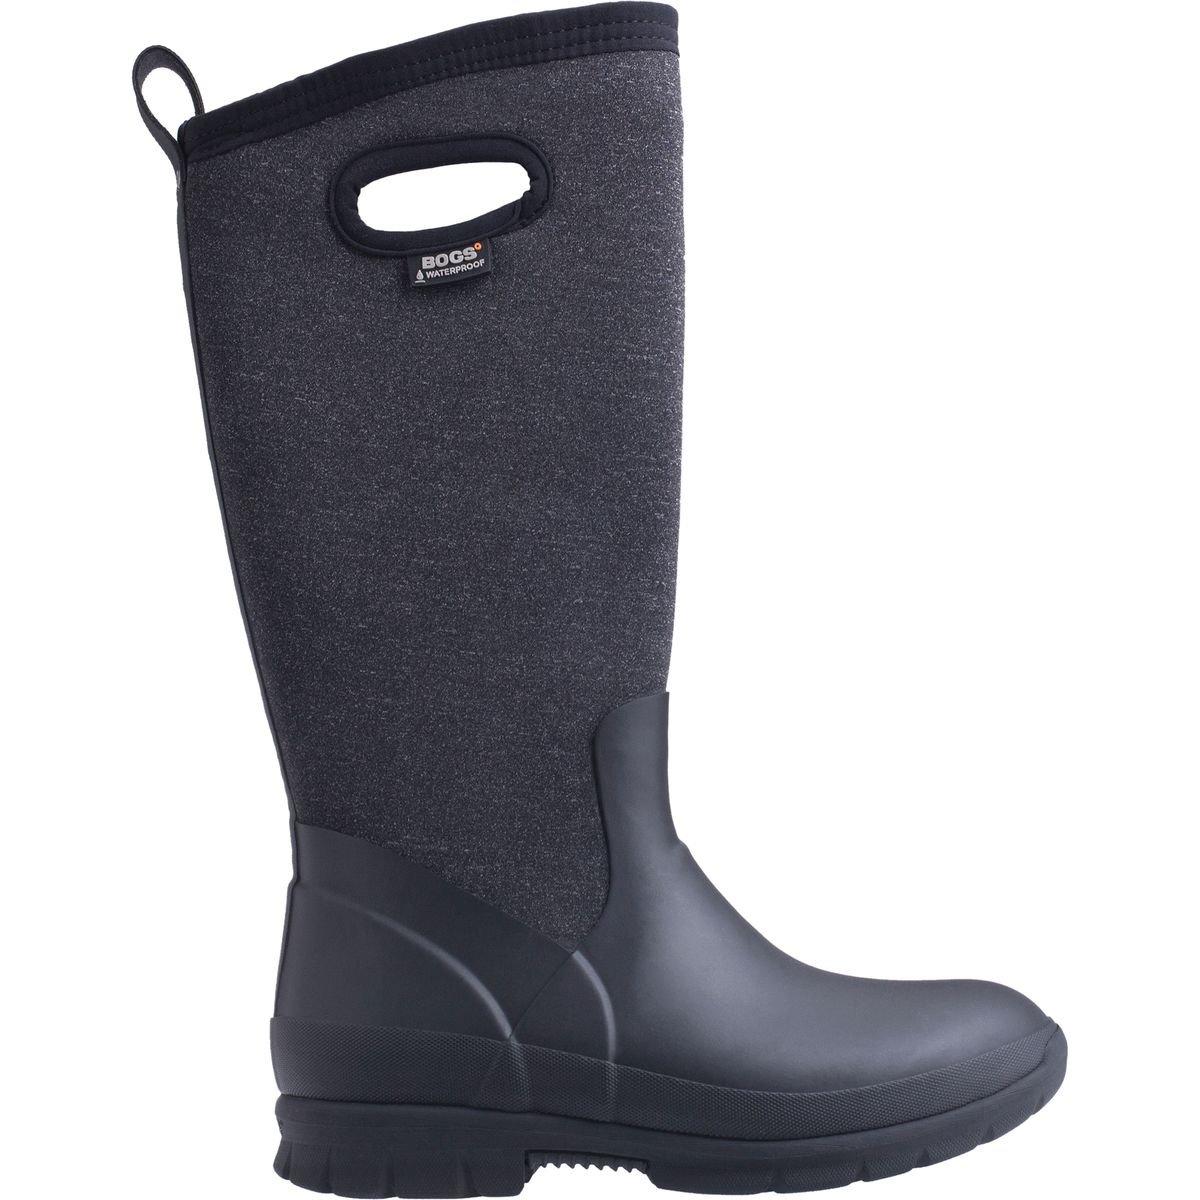 Bogs Women's Crandall Tall Snow Boot, Black/Multi, 8 M US